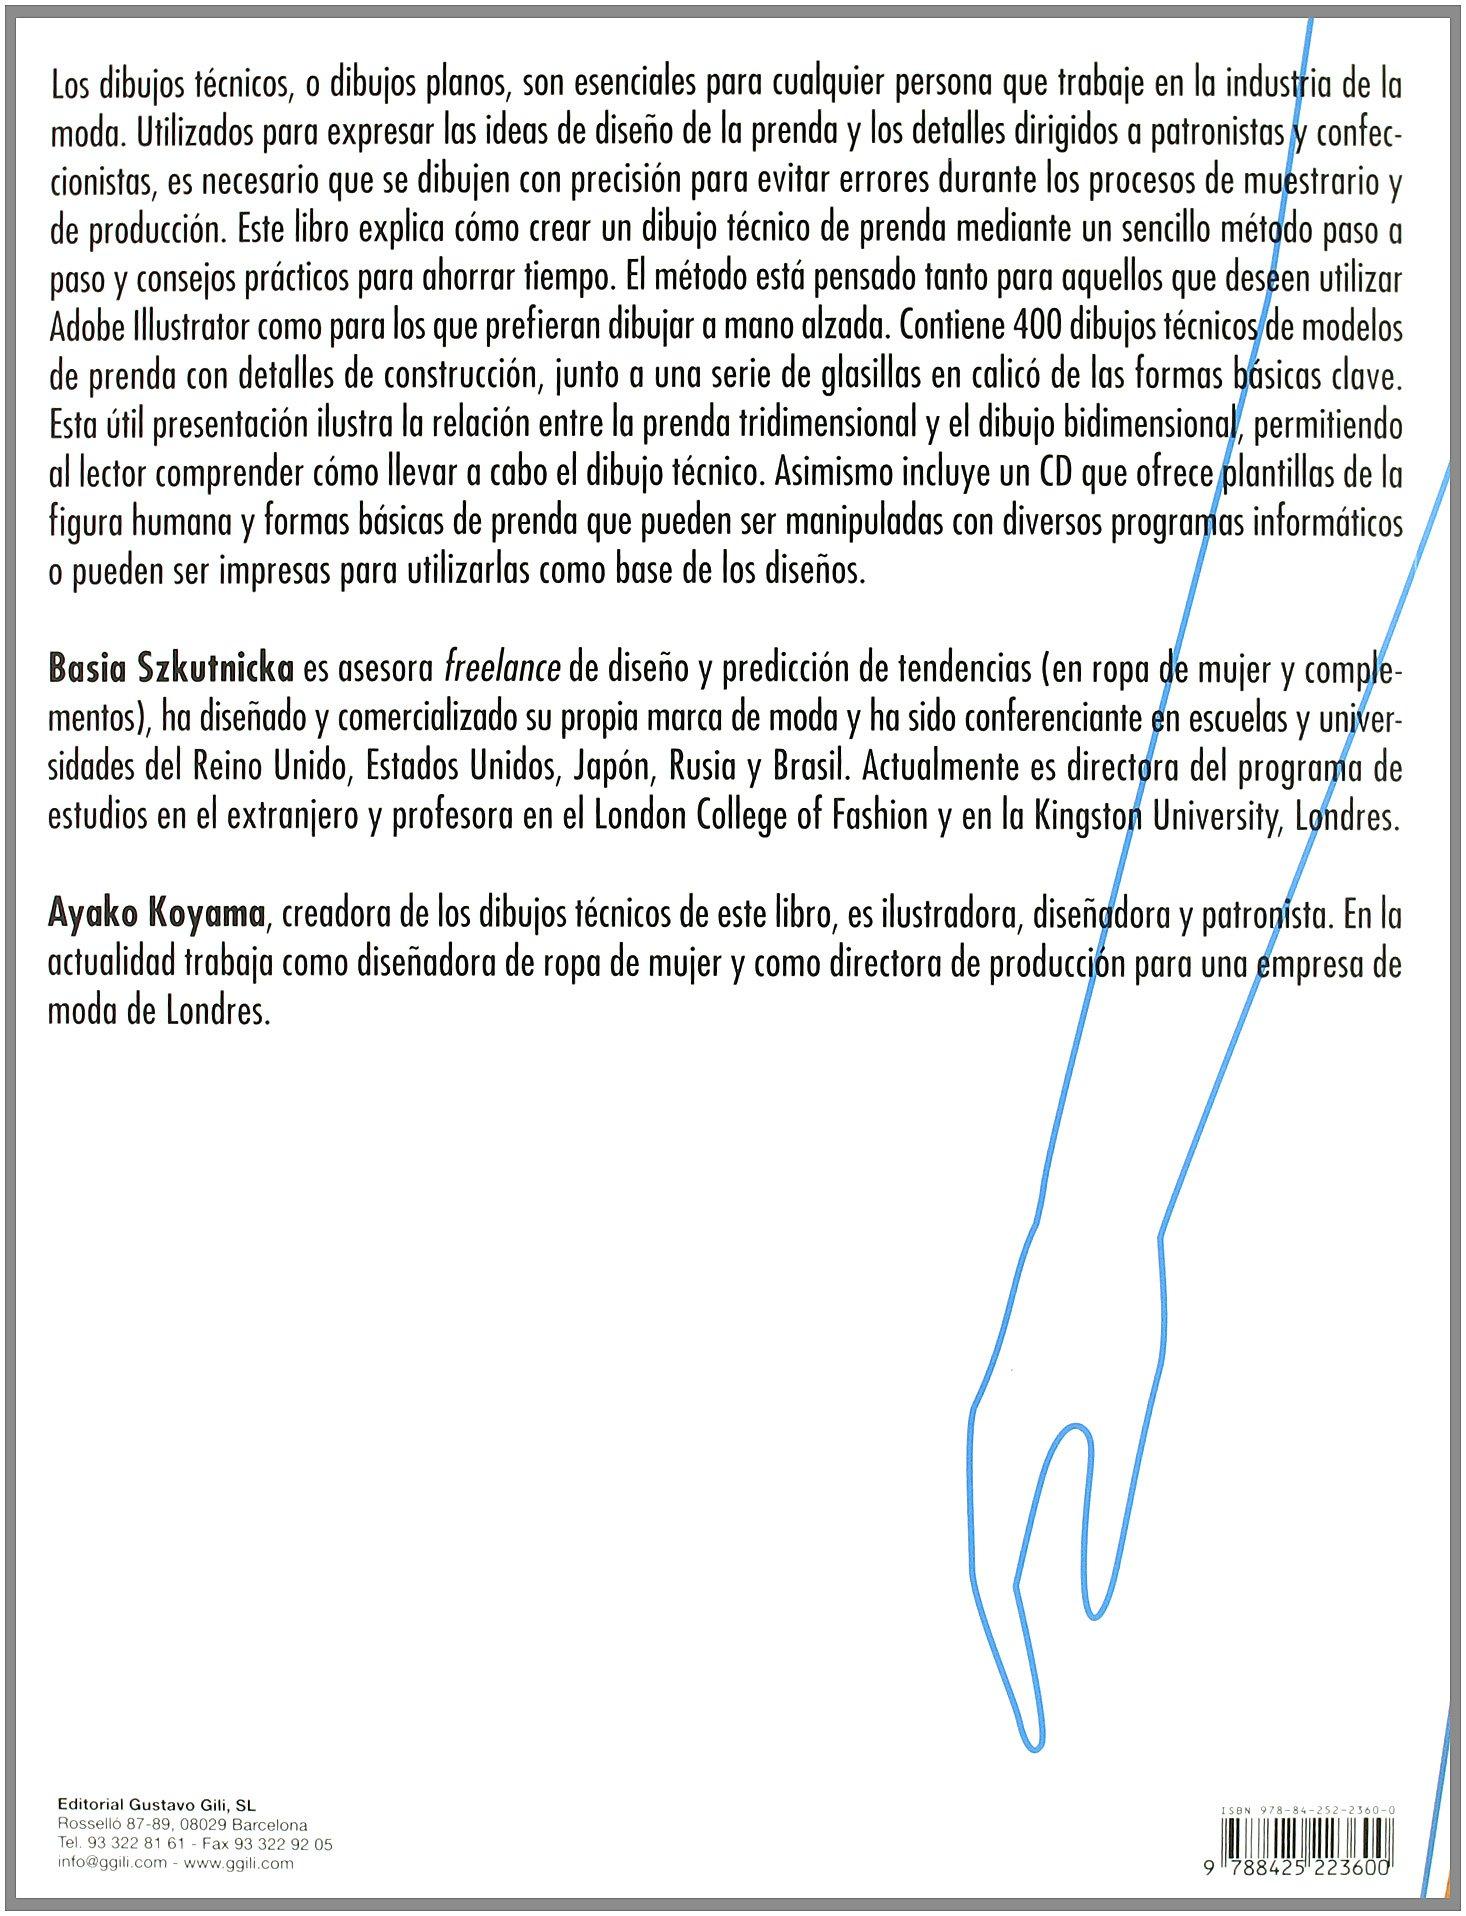 El dibujo técnico de moda paso a paso Gg Moda gustavo Gili: Amazon.es: Basia Szkutnicka, Ayako Koyama: Libros